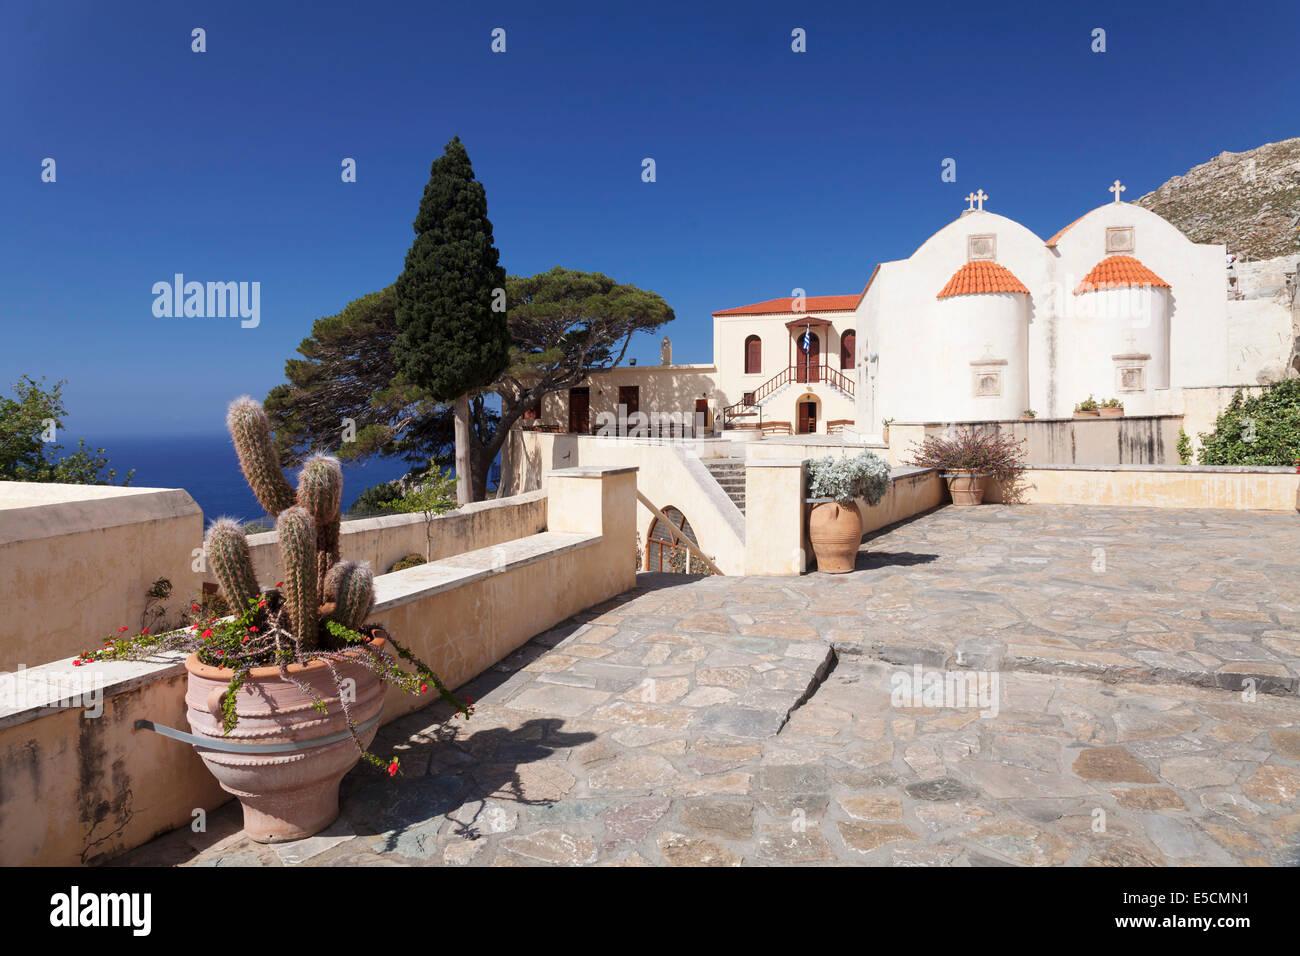 Monastery of Preveli, Rethymno, Crete, Greece - Stock Image